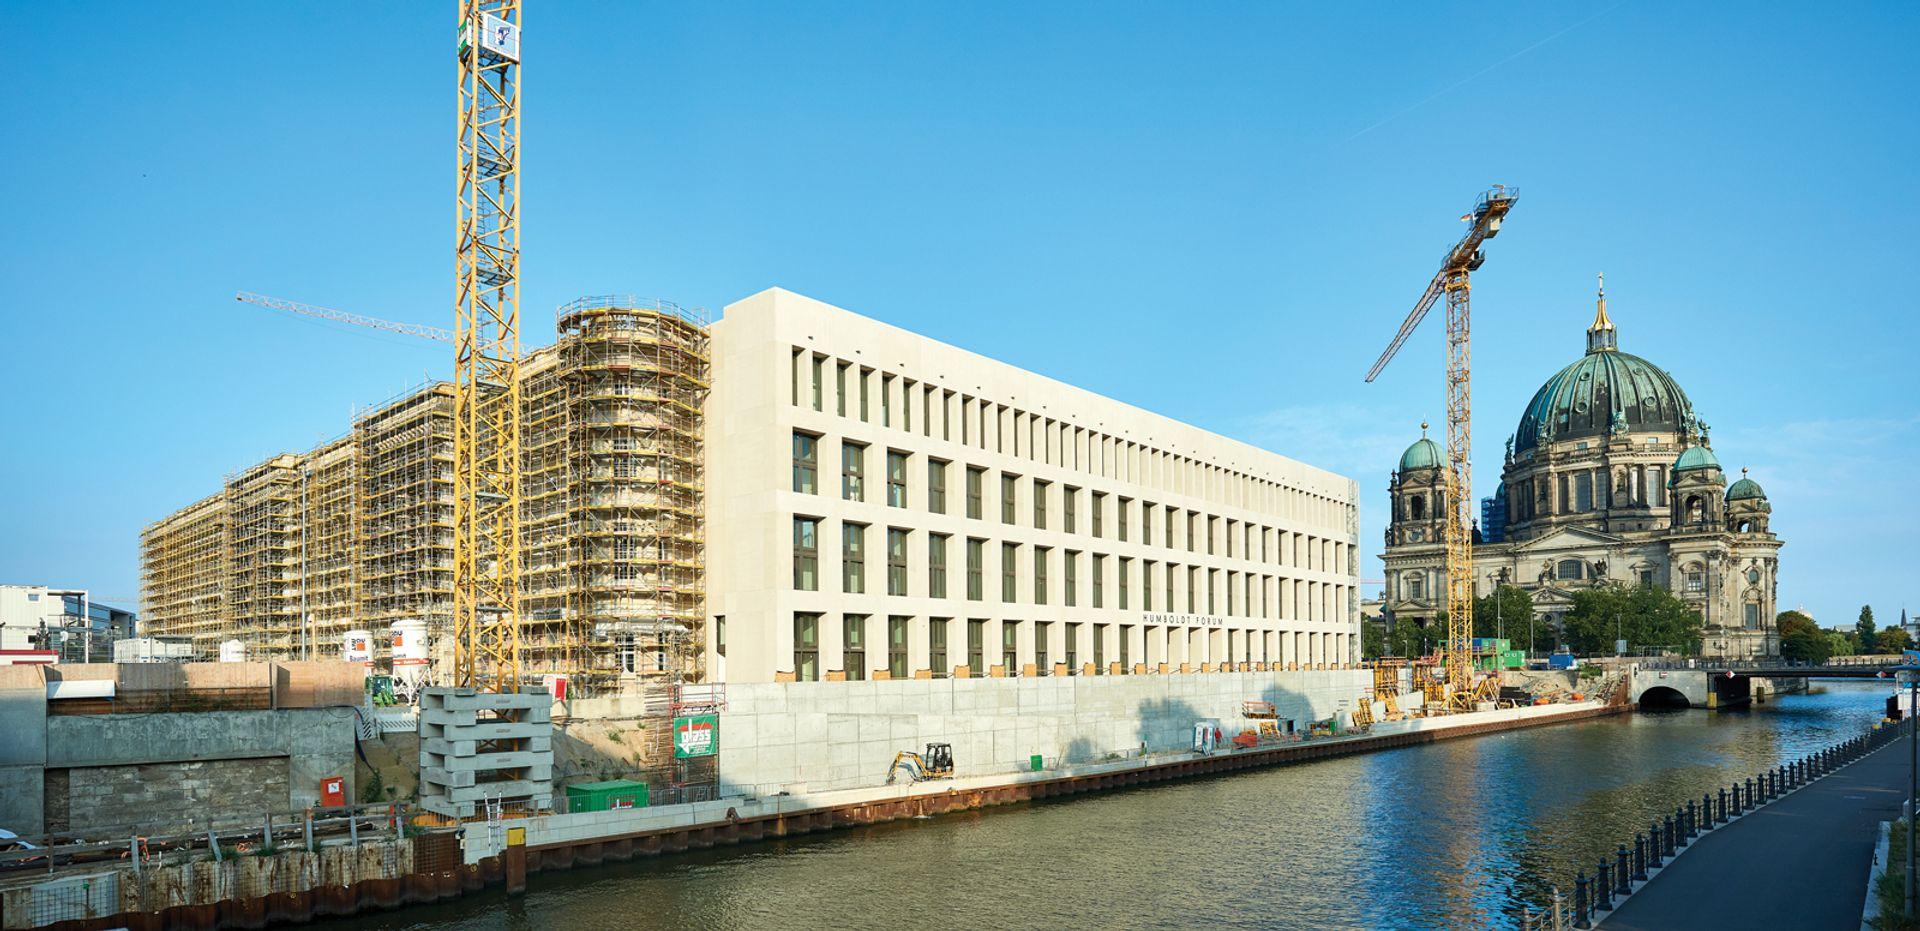 The Humboldt Forum under construction © SHF/Stephan Falk